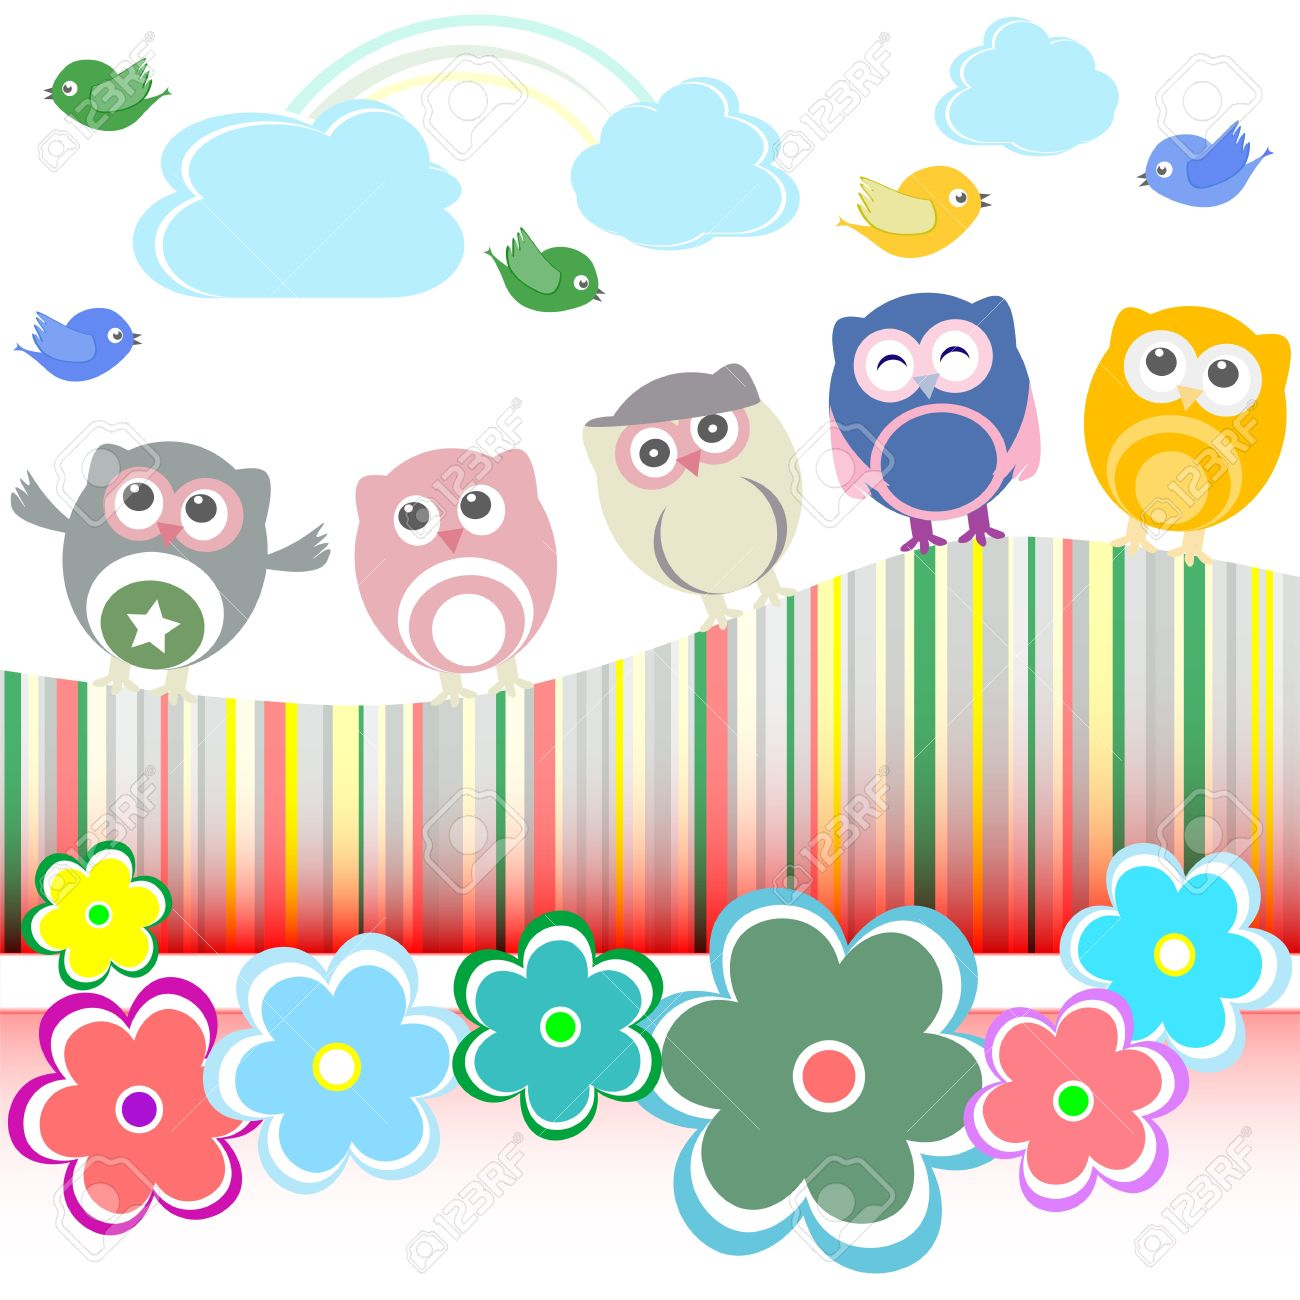 Gambar Wallpaper Kartun Stitch Gudang Wallpaper